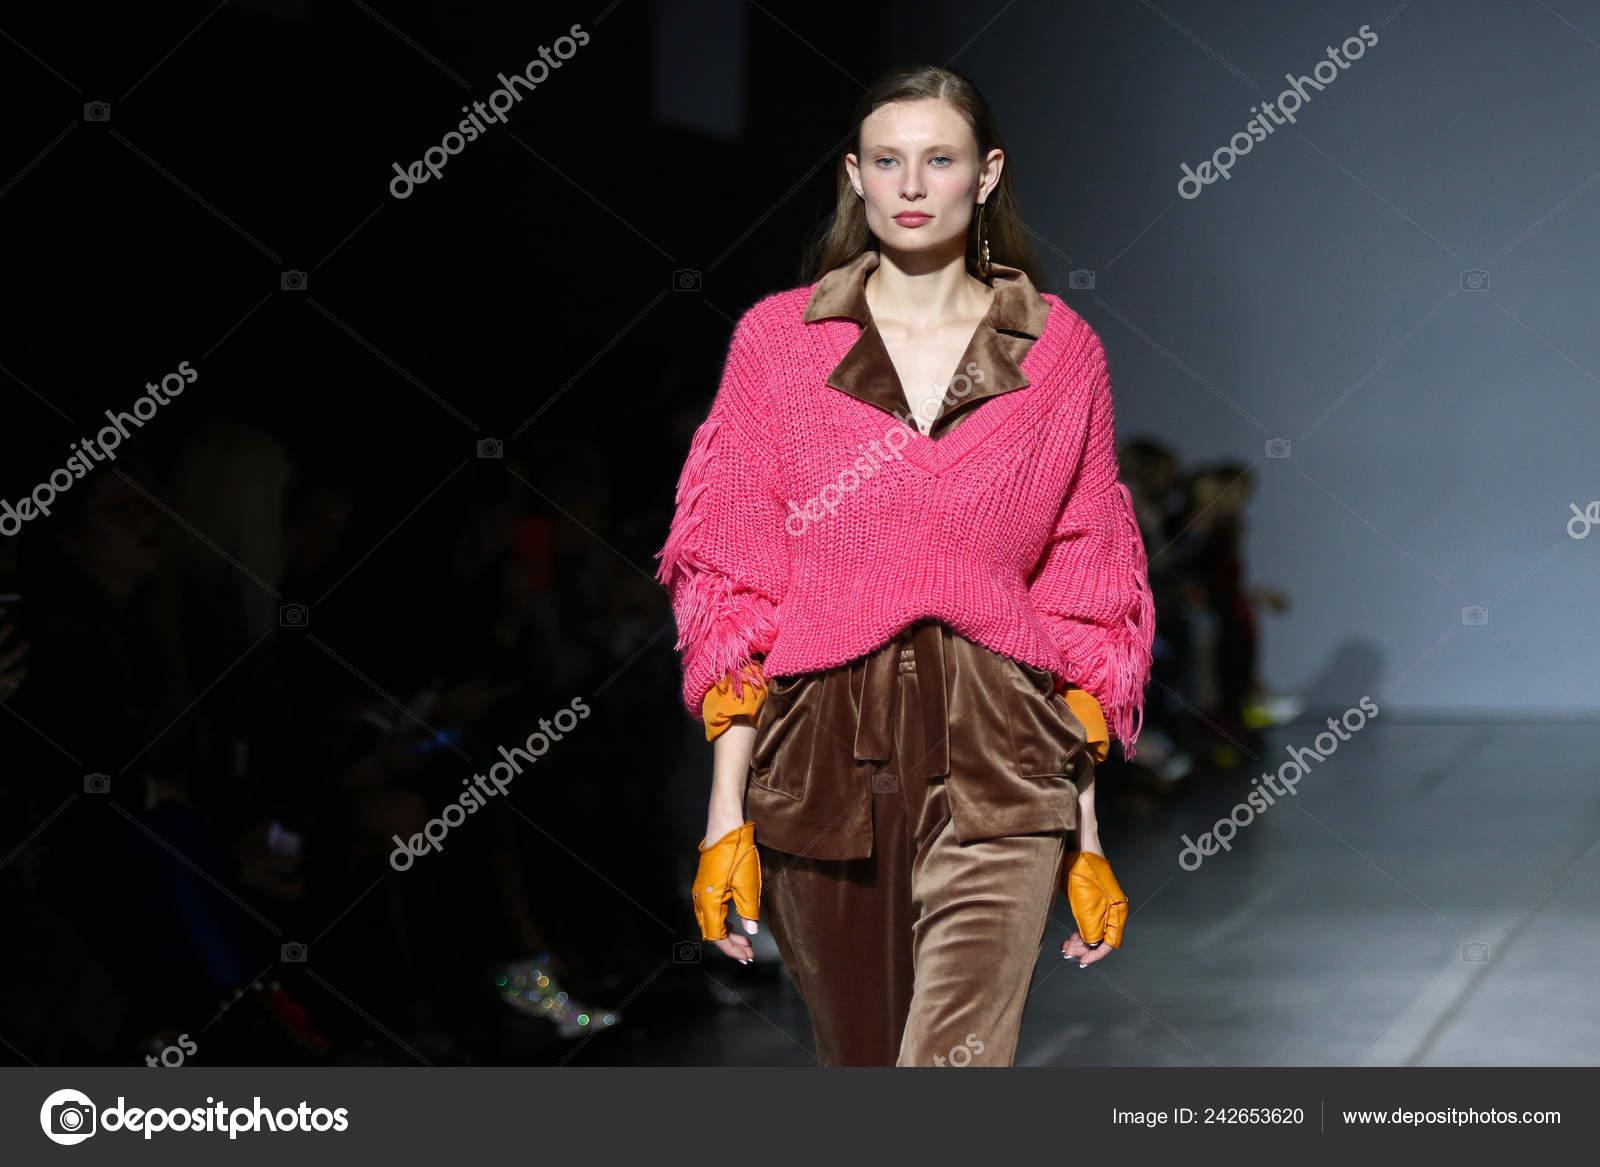 9db14972d97 KYIV, UKRAINE - FEBRUARY 3, 2019: Model presents a fashion creation of  A/RAISE brand during the 44th Ukrainian Fashion Week season Fall/Winter 2019/20  at ...